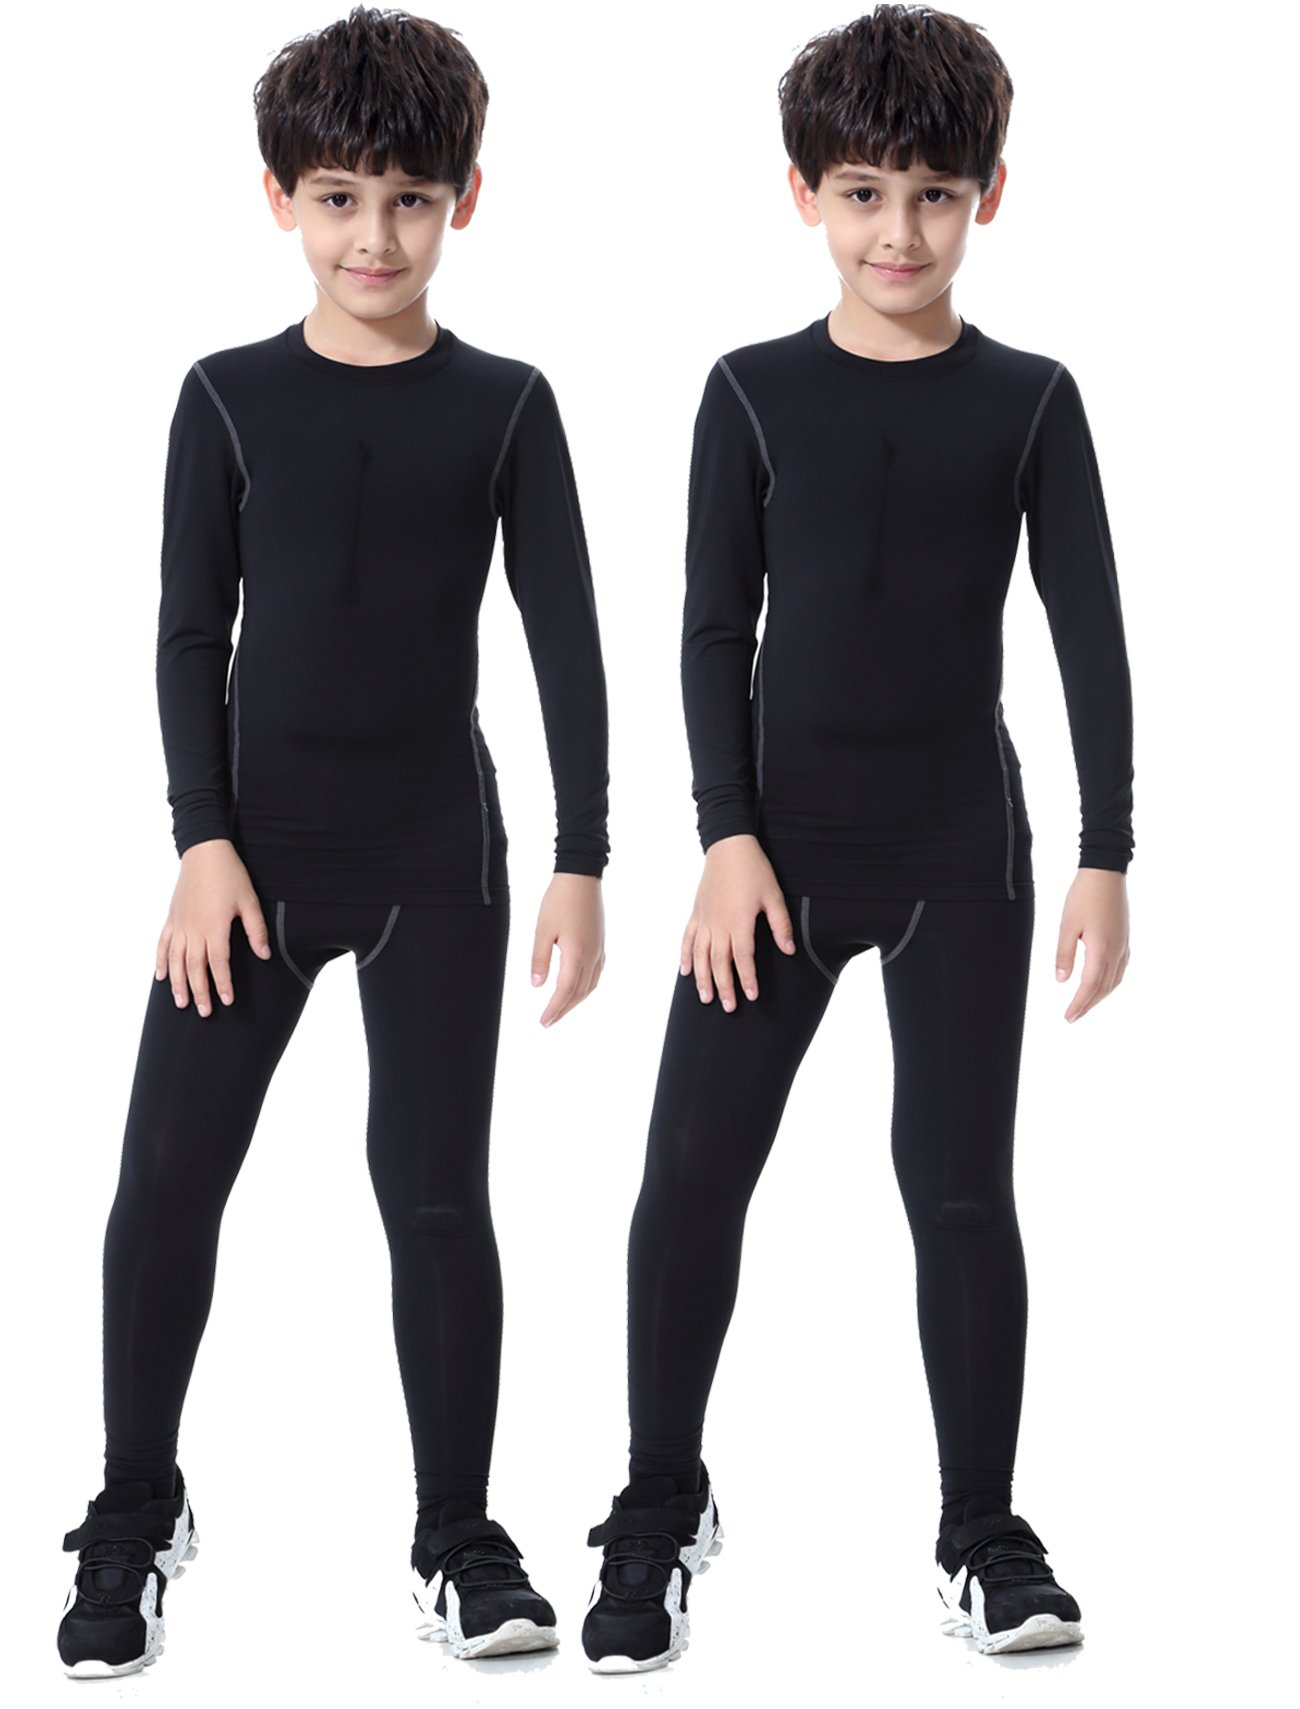 LNJLVI 2 Packs Athletic Compression Long Sleeve Shirts and Pants Set(Black,12)